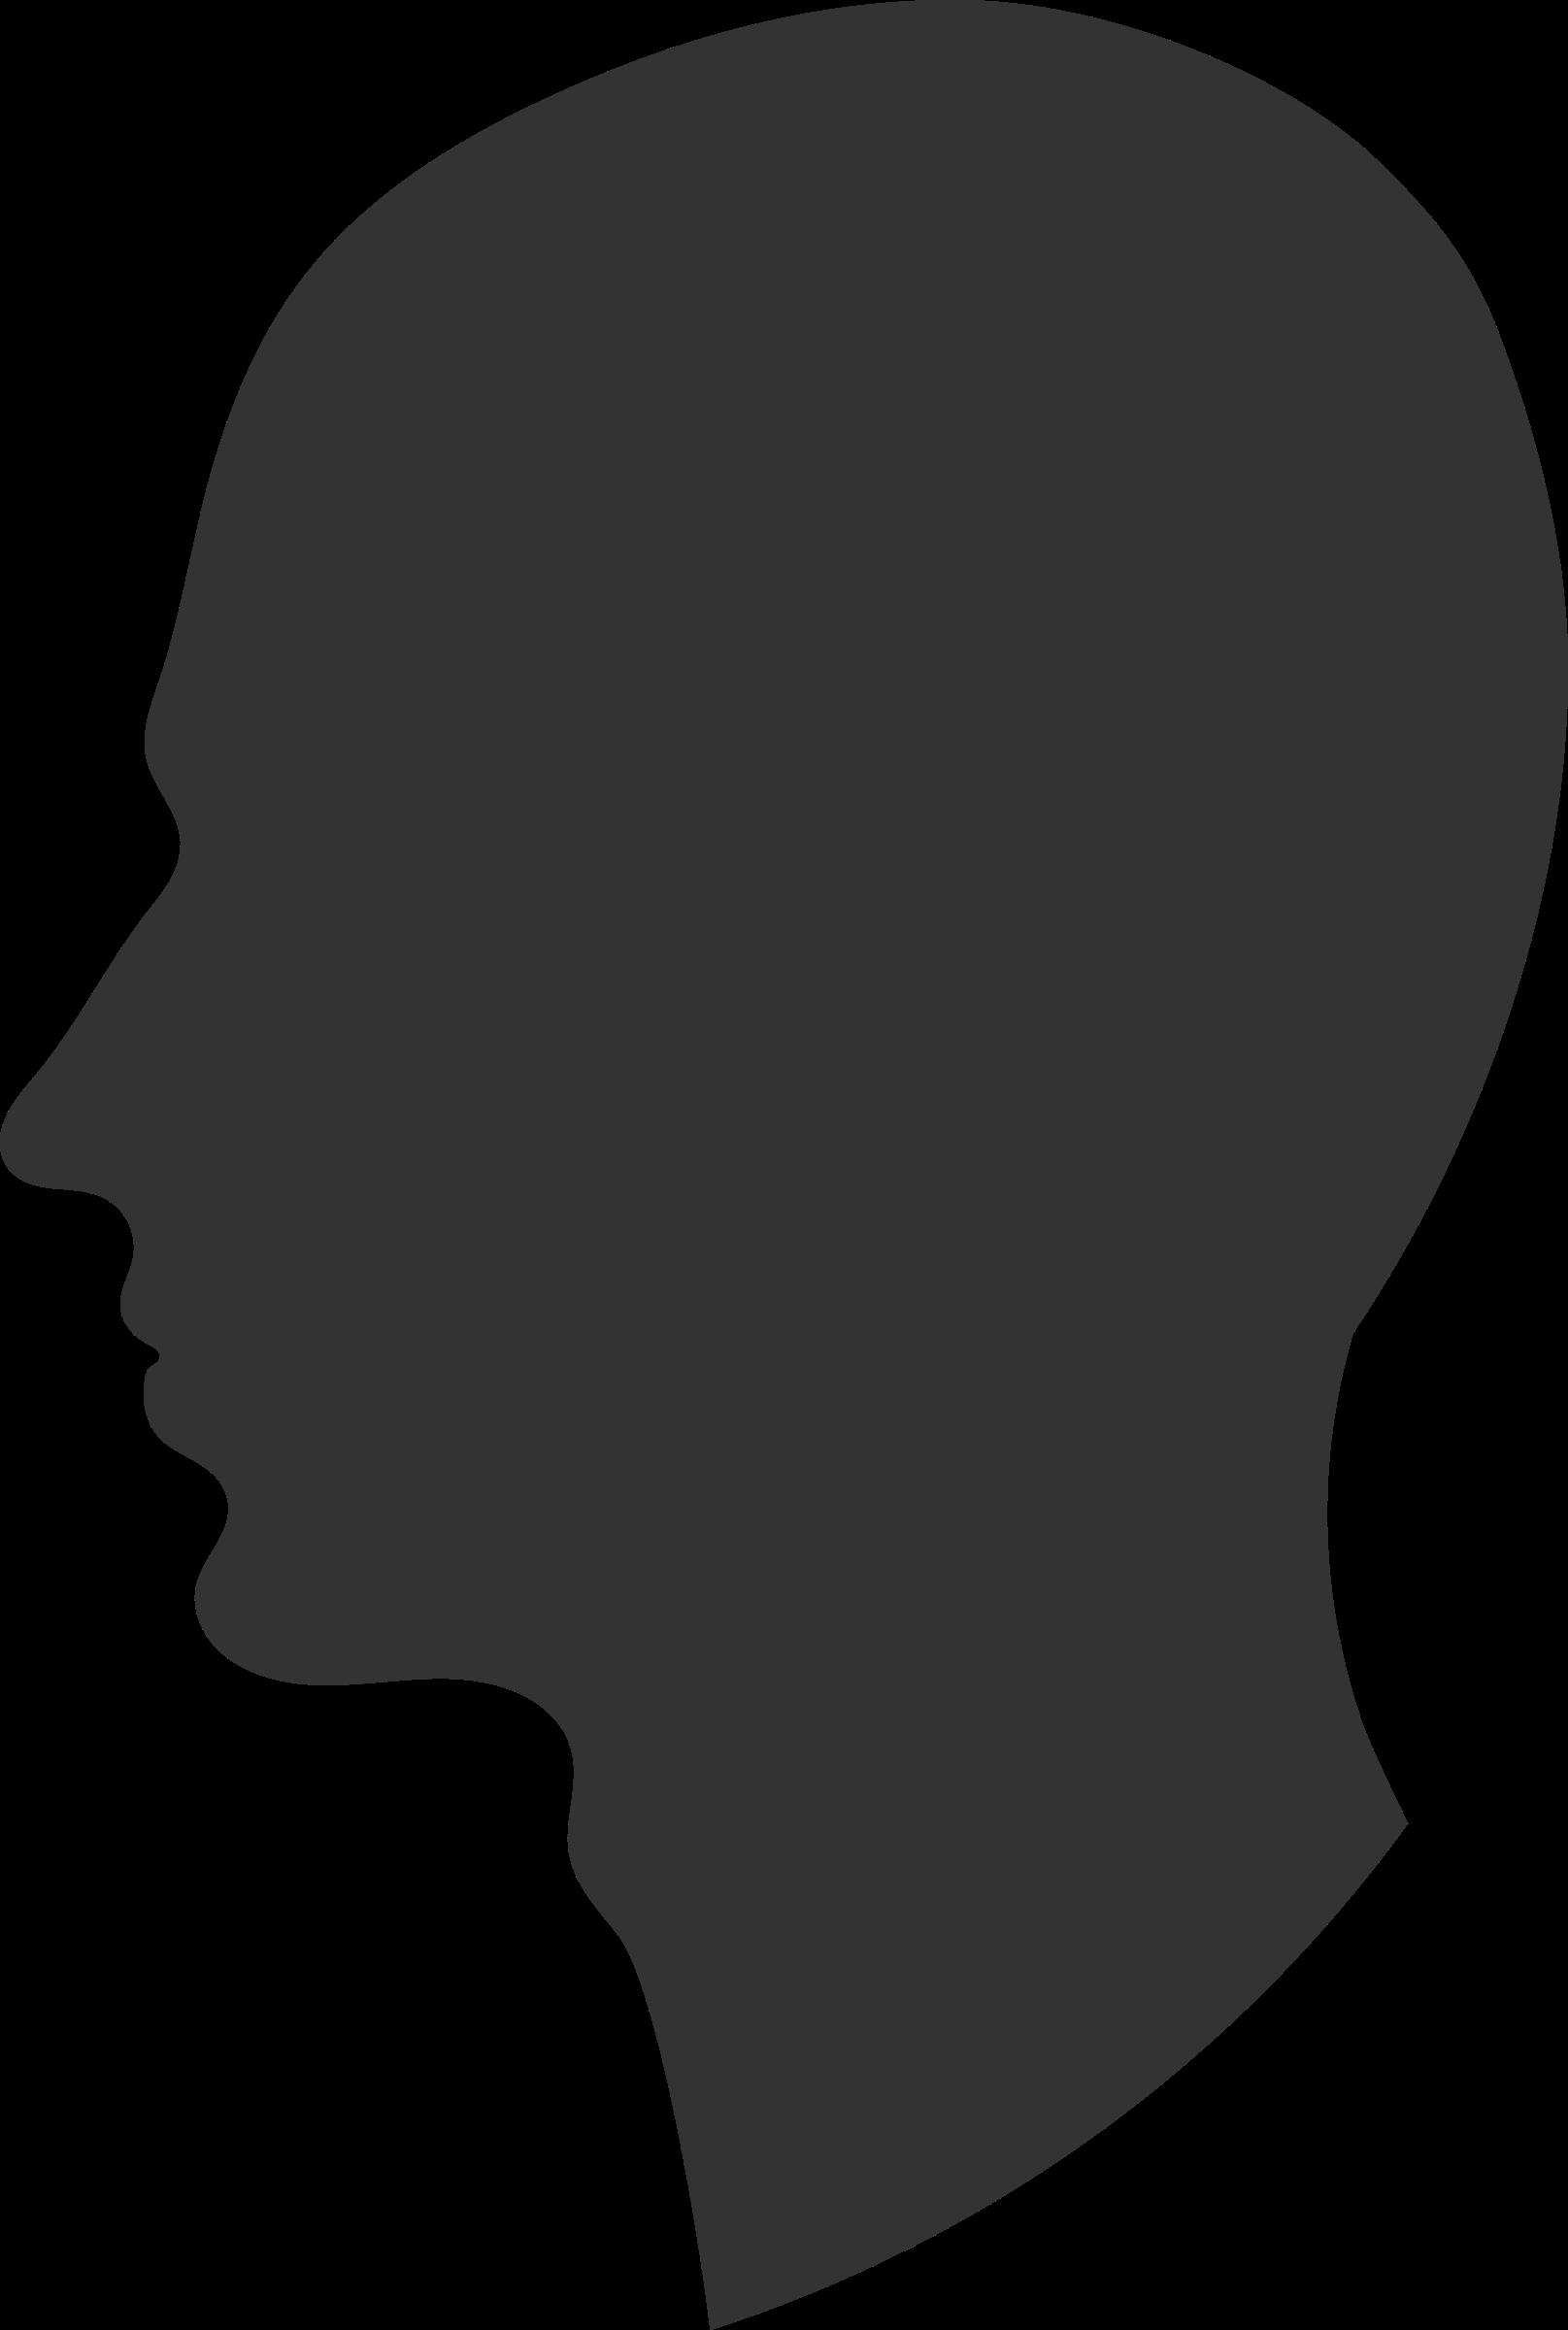 Head profile   1615 x 2400 png 23kB